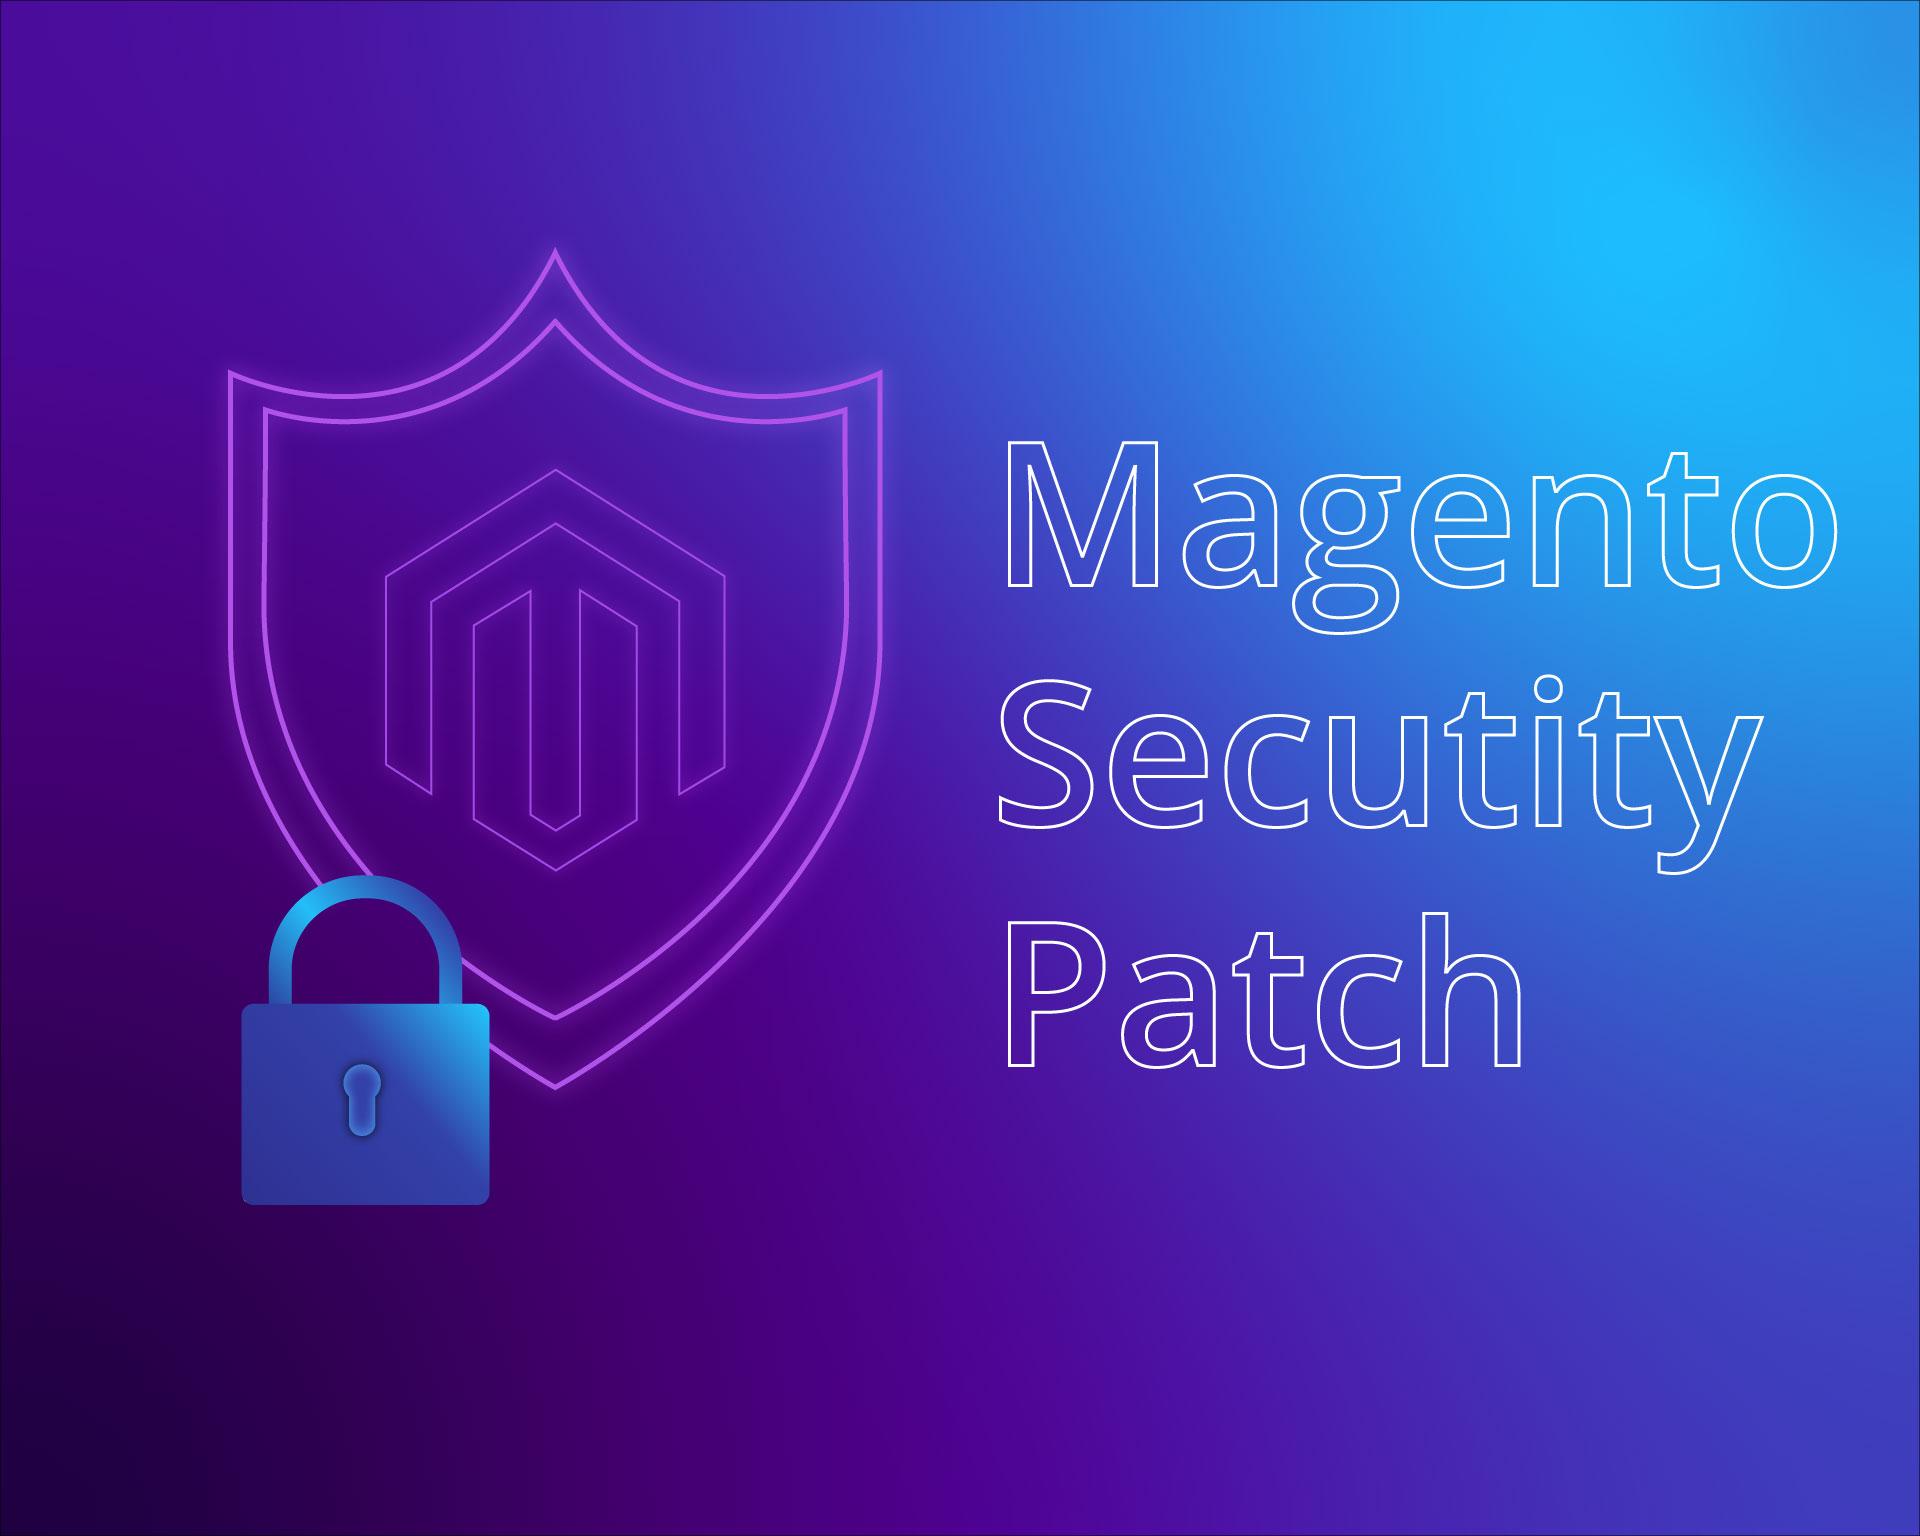 Magento Secutity Patch